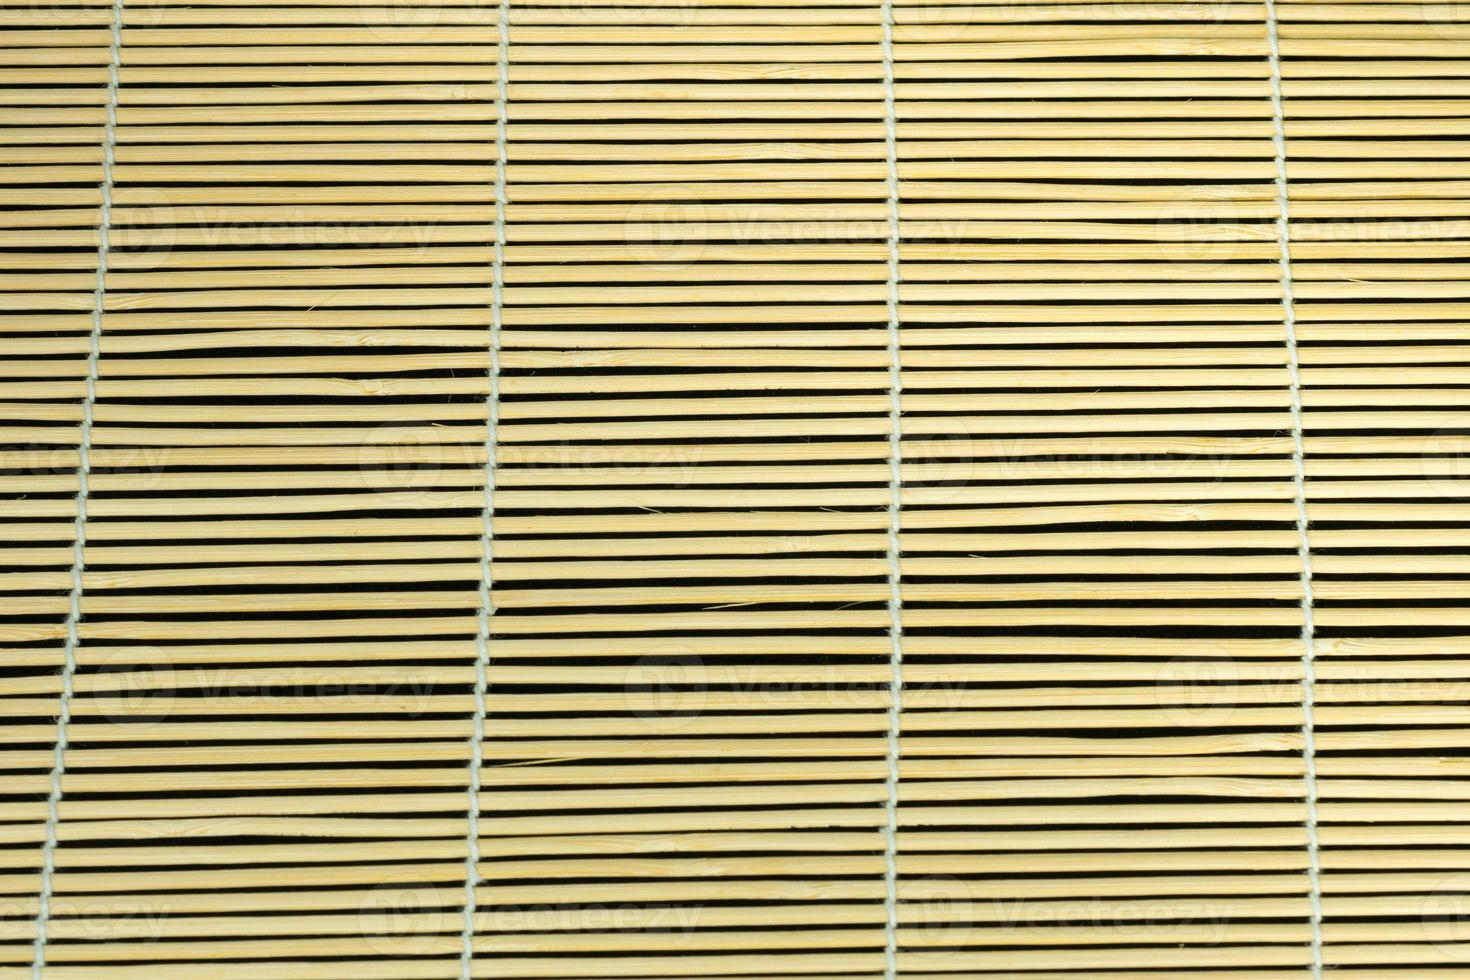 bamboe gordijn. foto